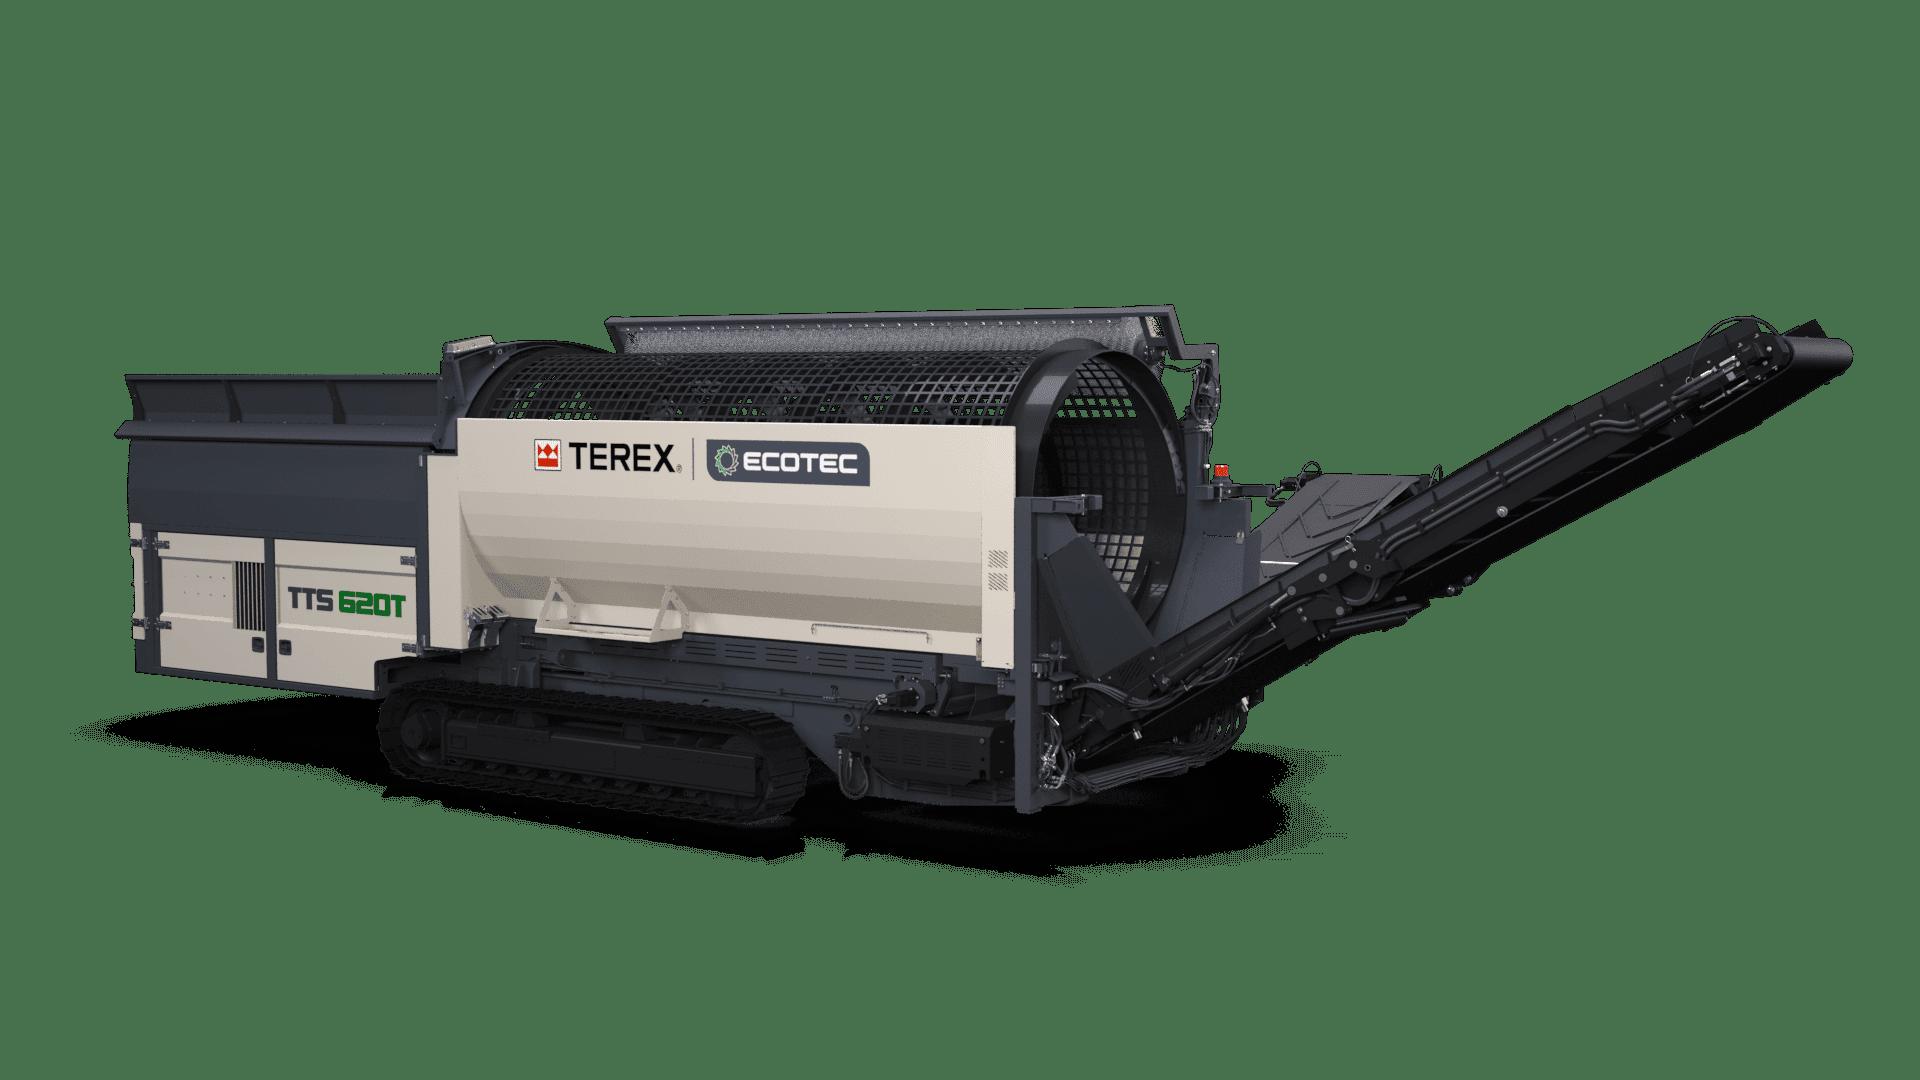 Ecotec TTS 620T Tracked Trommel Screener